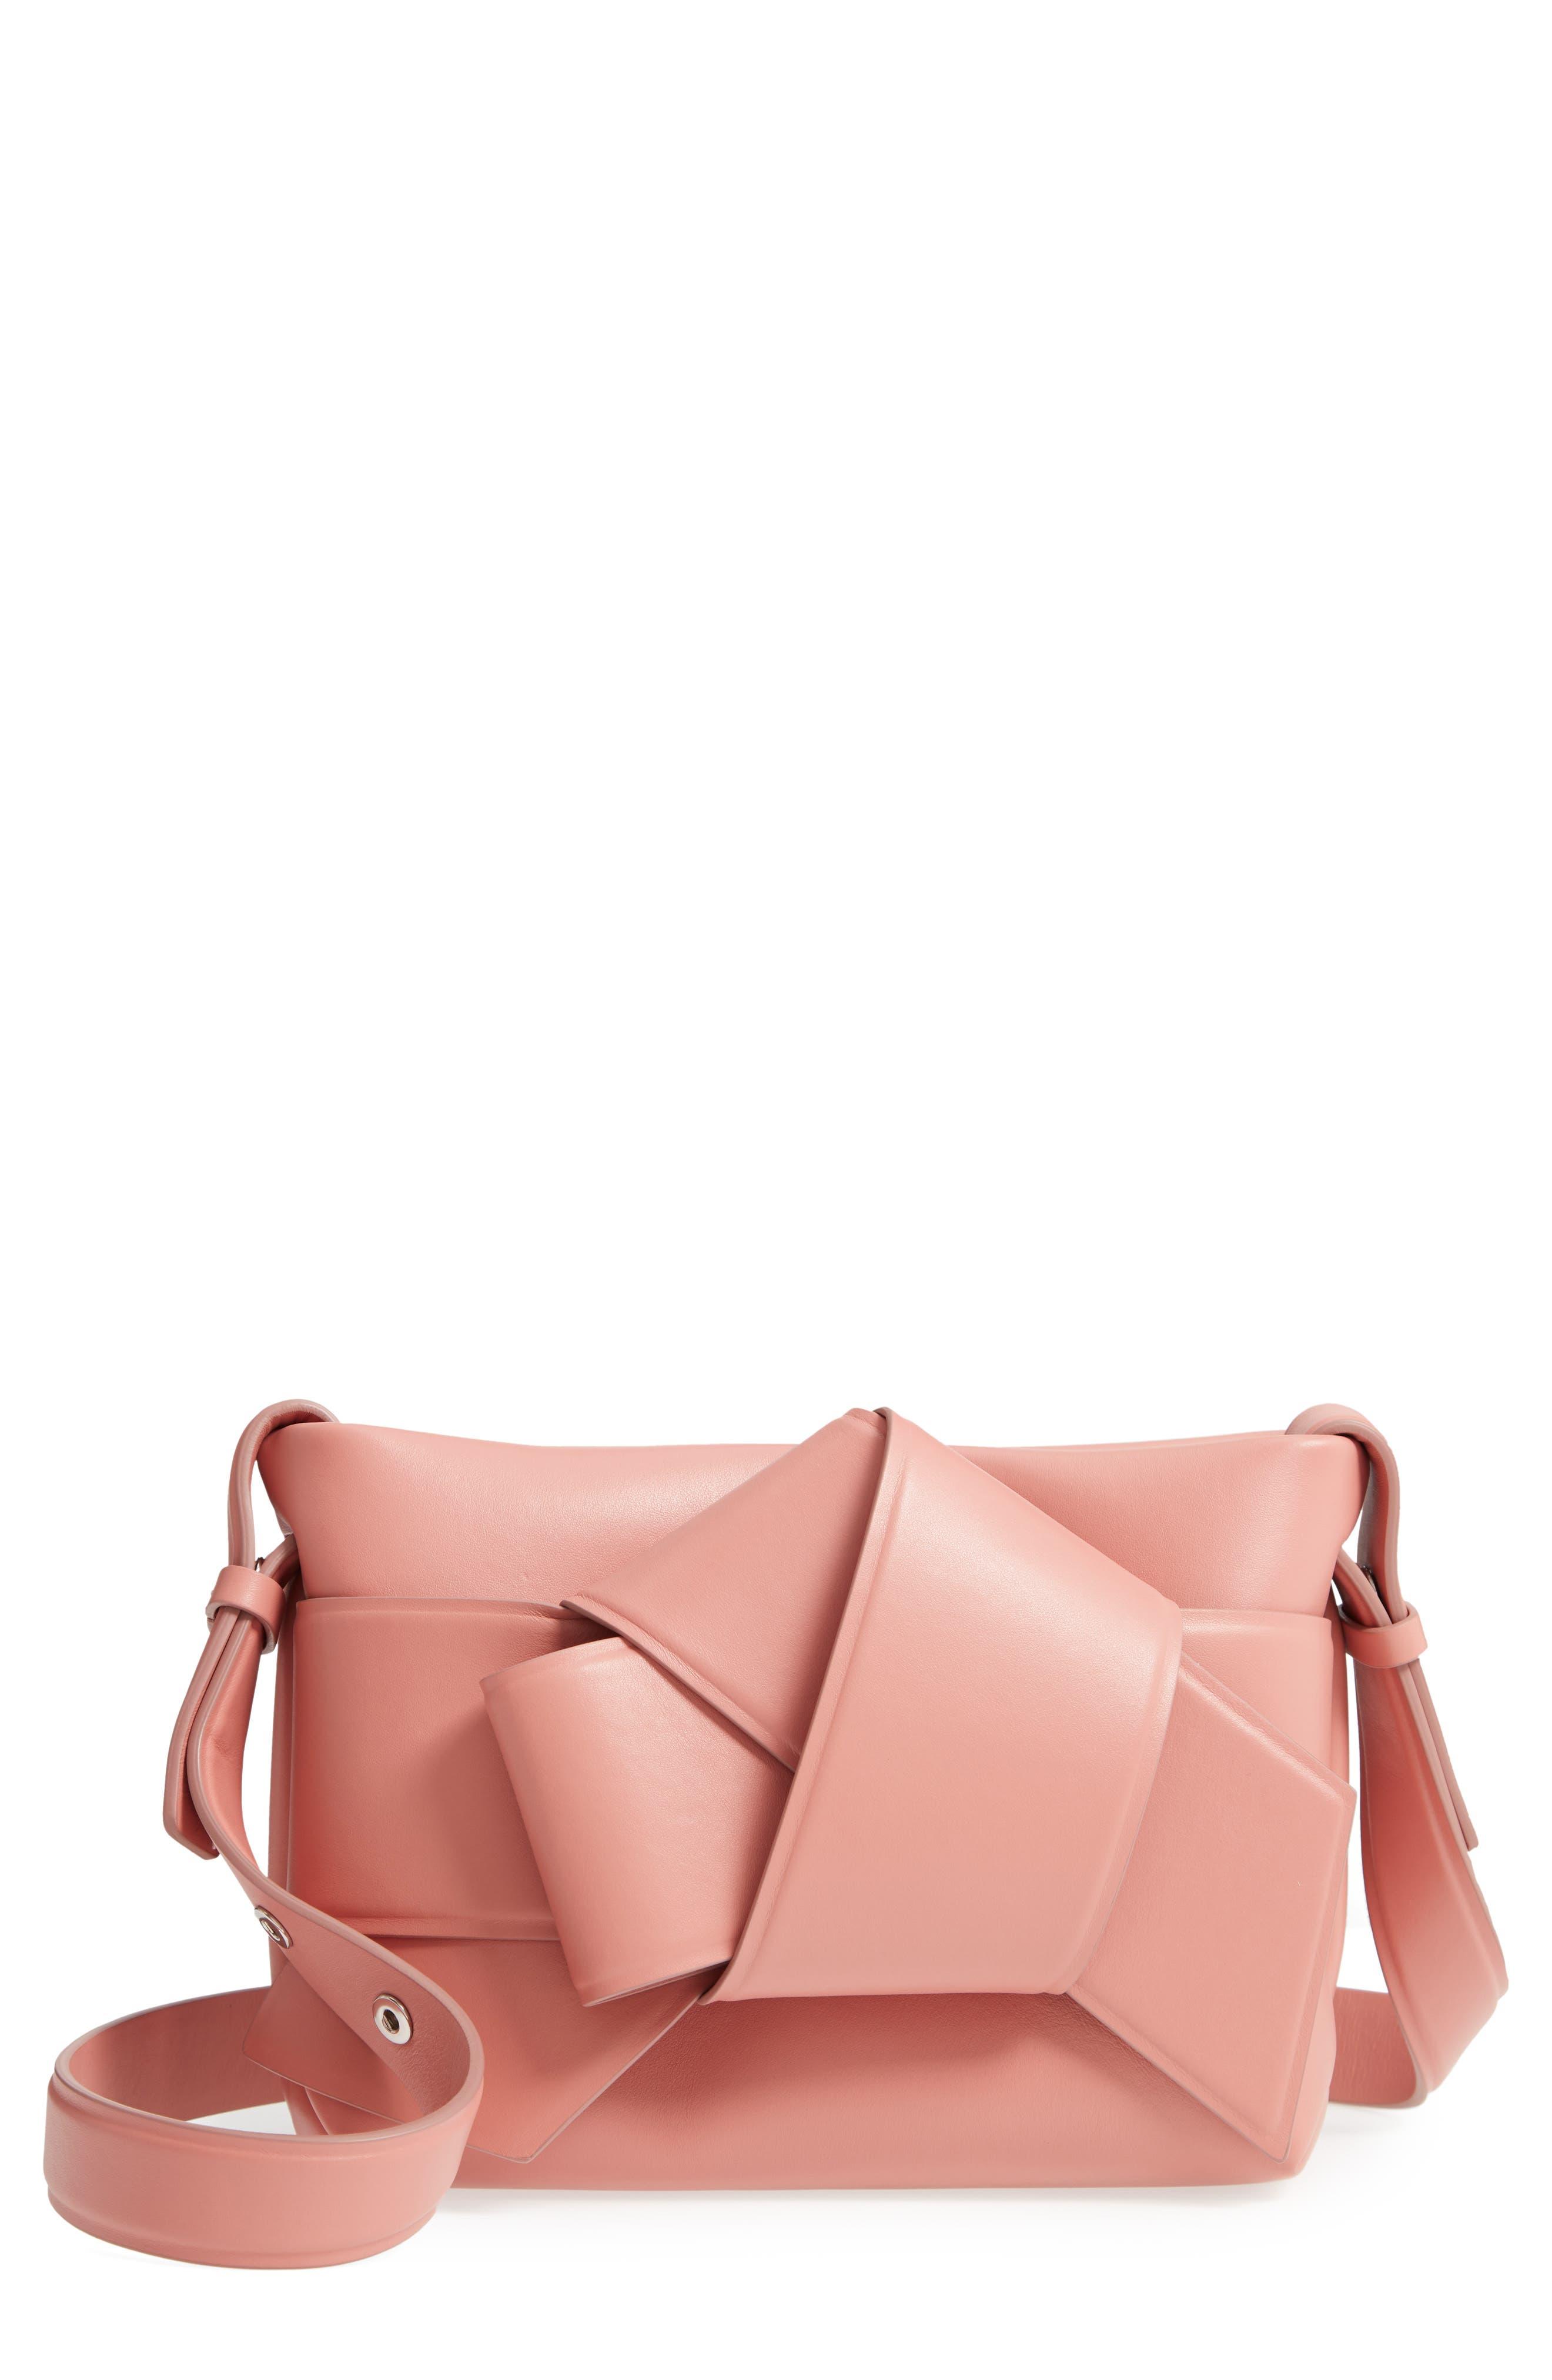 Musubi Knot Leather Handbag, Main, color, PINK